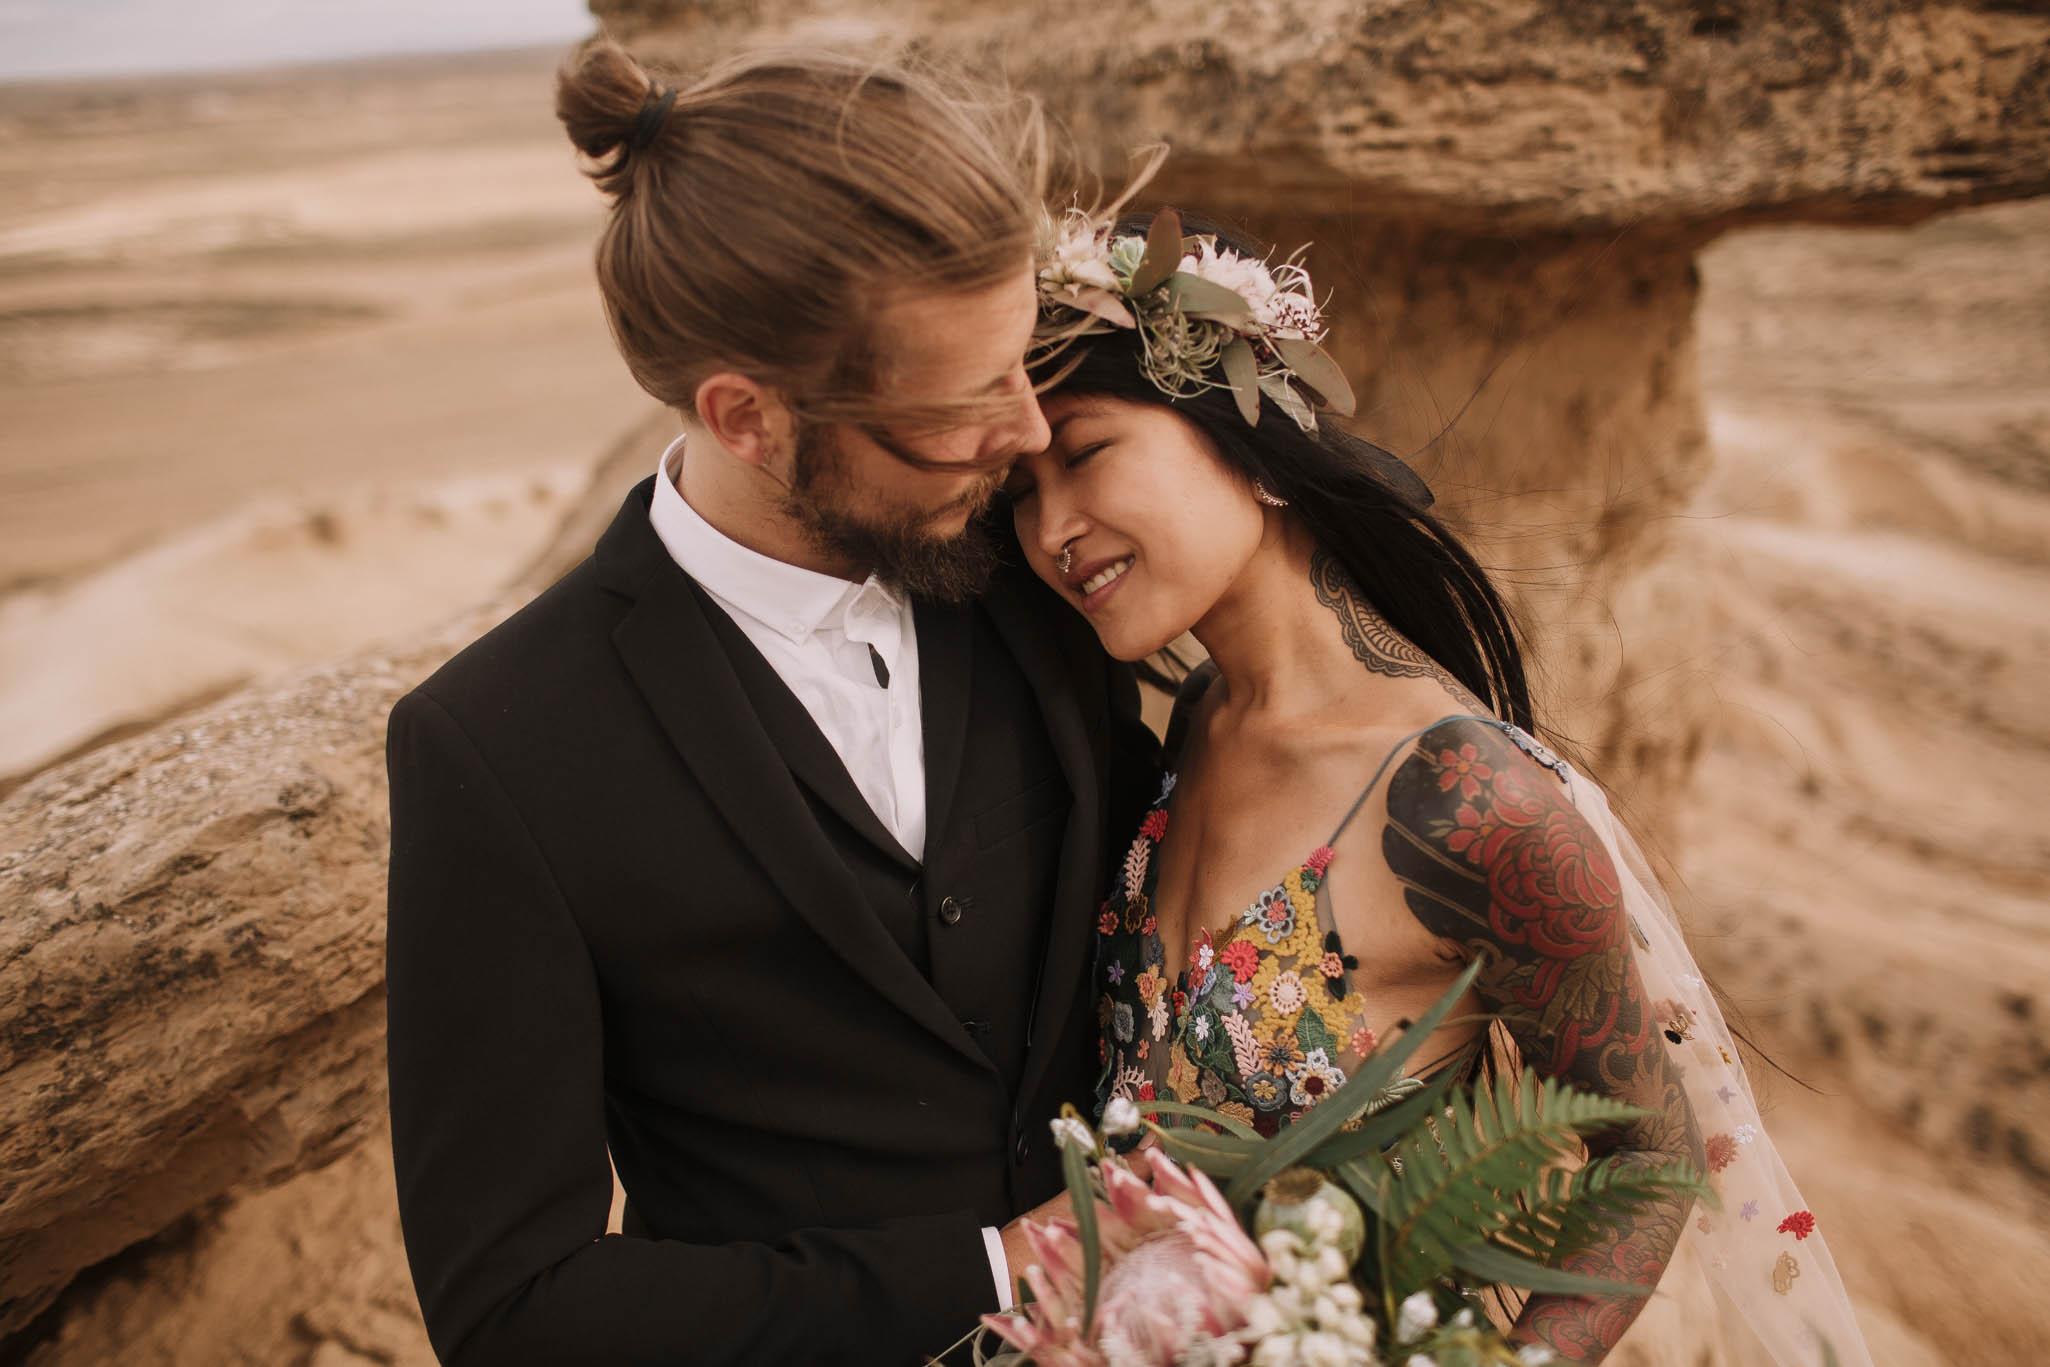 Spain-wedding-photographer-bardenas-reales-jeremy-boyer-photographe-mariage-bordeaux-floral-wedding-dress-robe-124.jpg